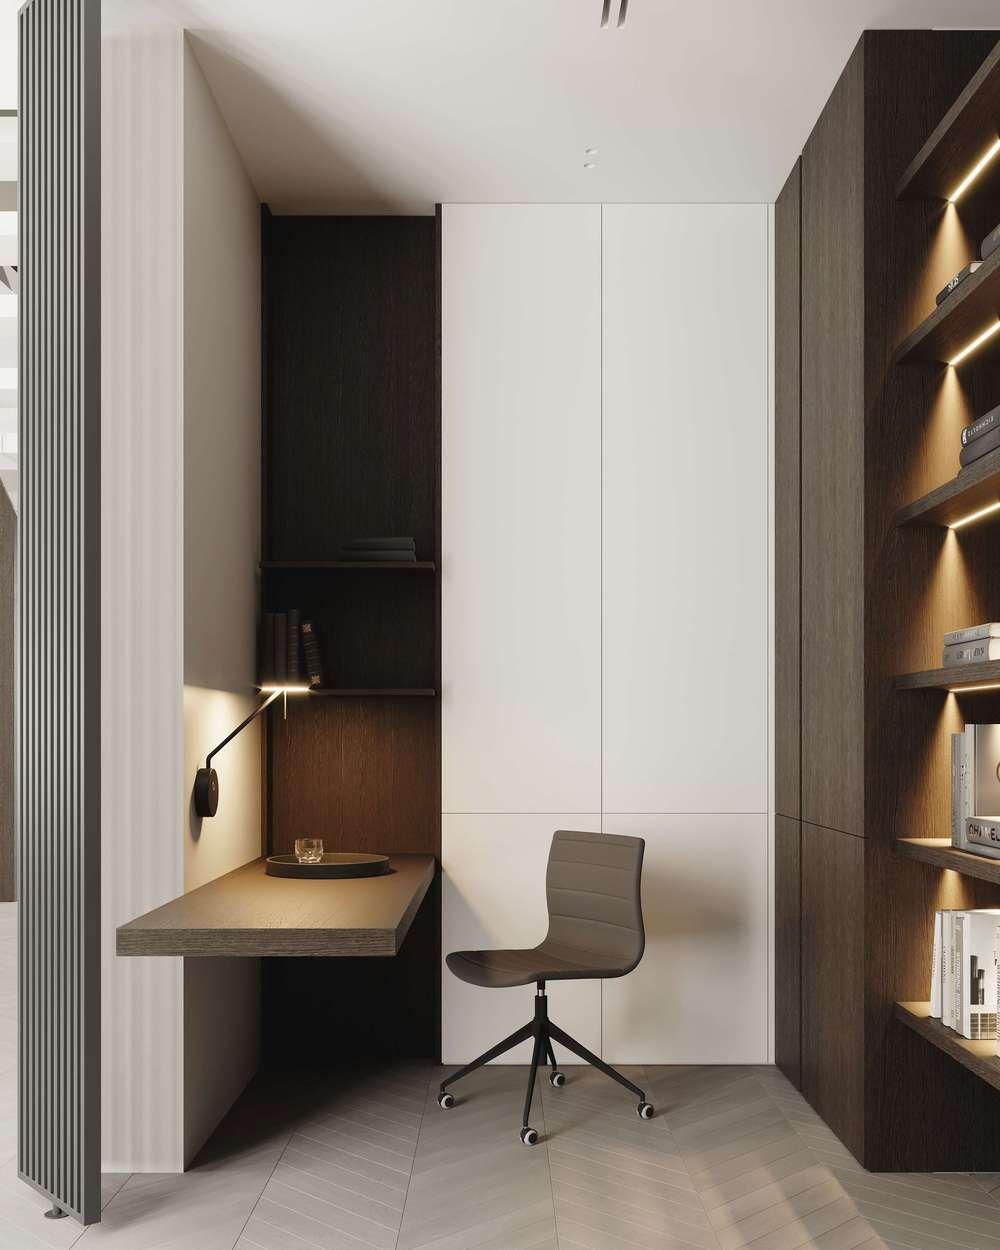 A M House House Wall Wardrobe Design Interior